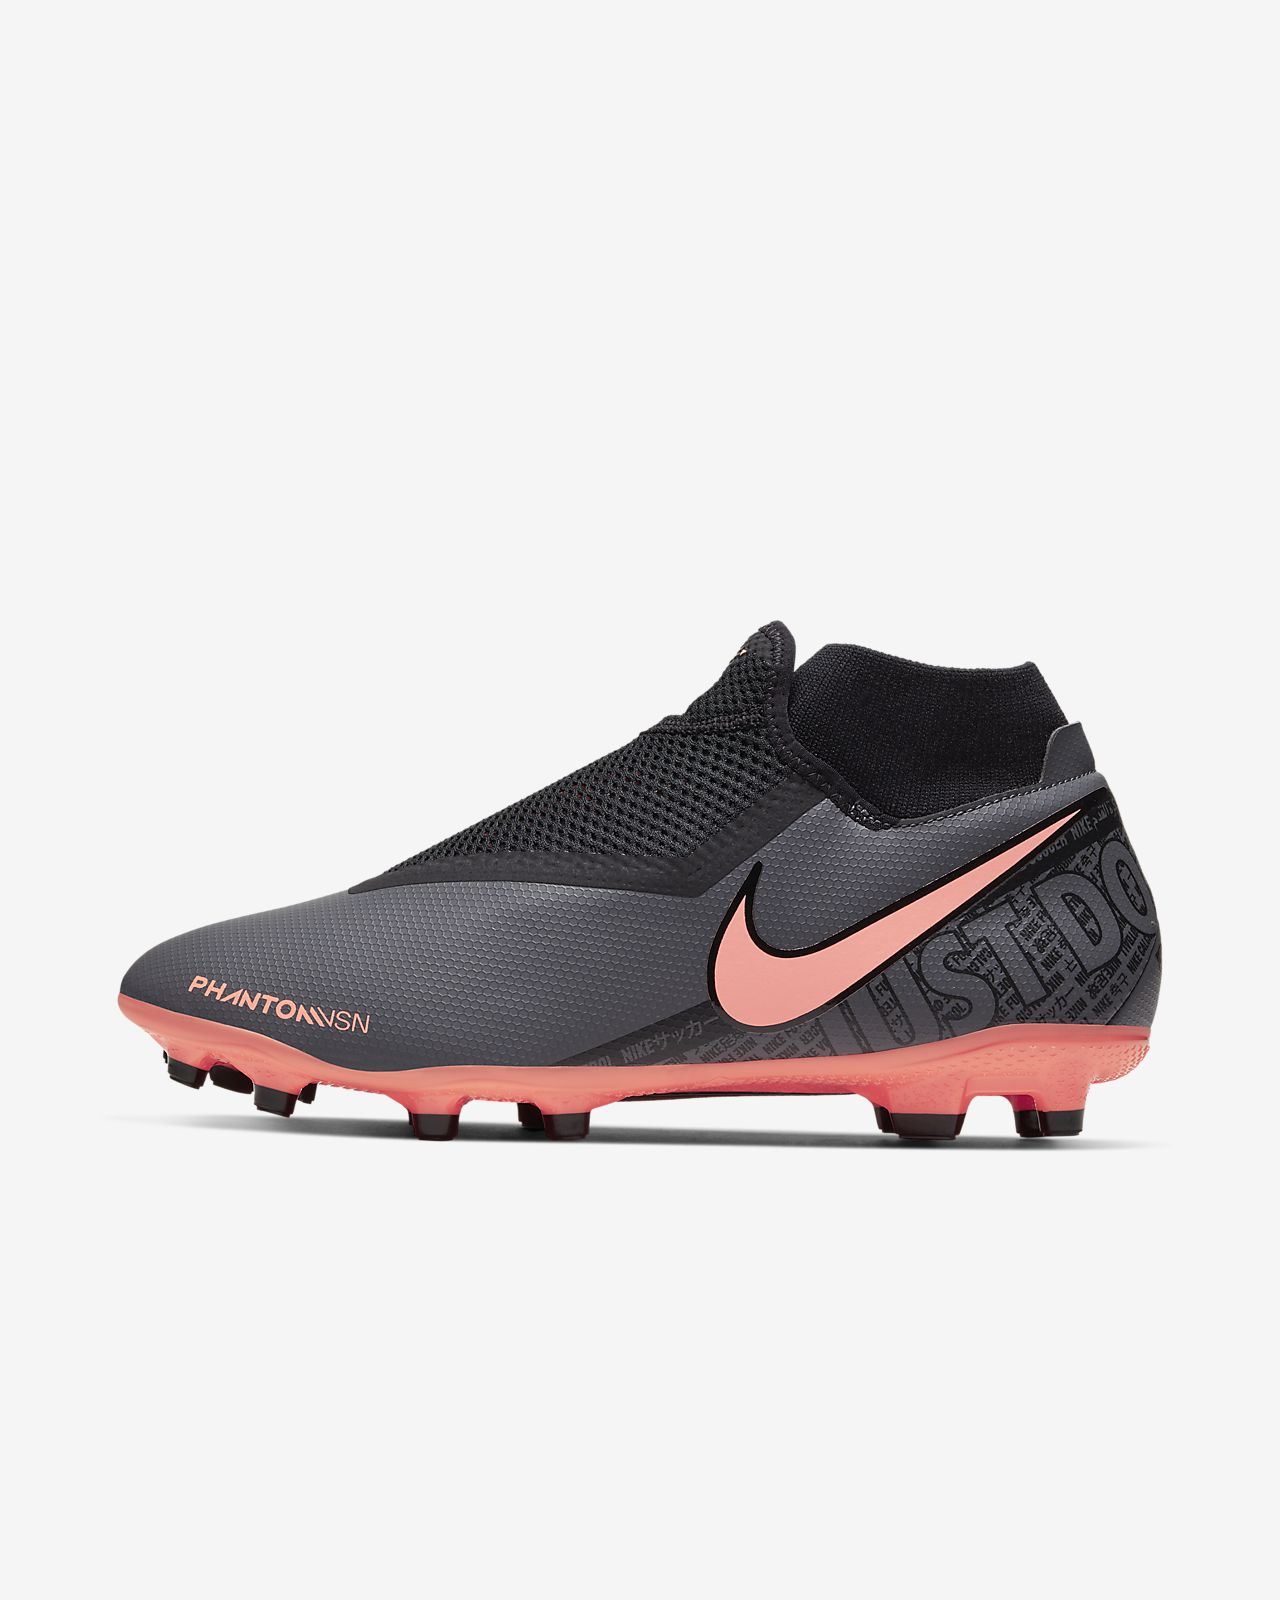 Nike Phantom Vision Academy Dynamic Fit MG 多種場地足球釘鞋